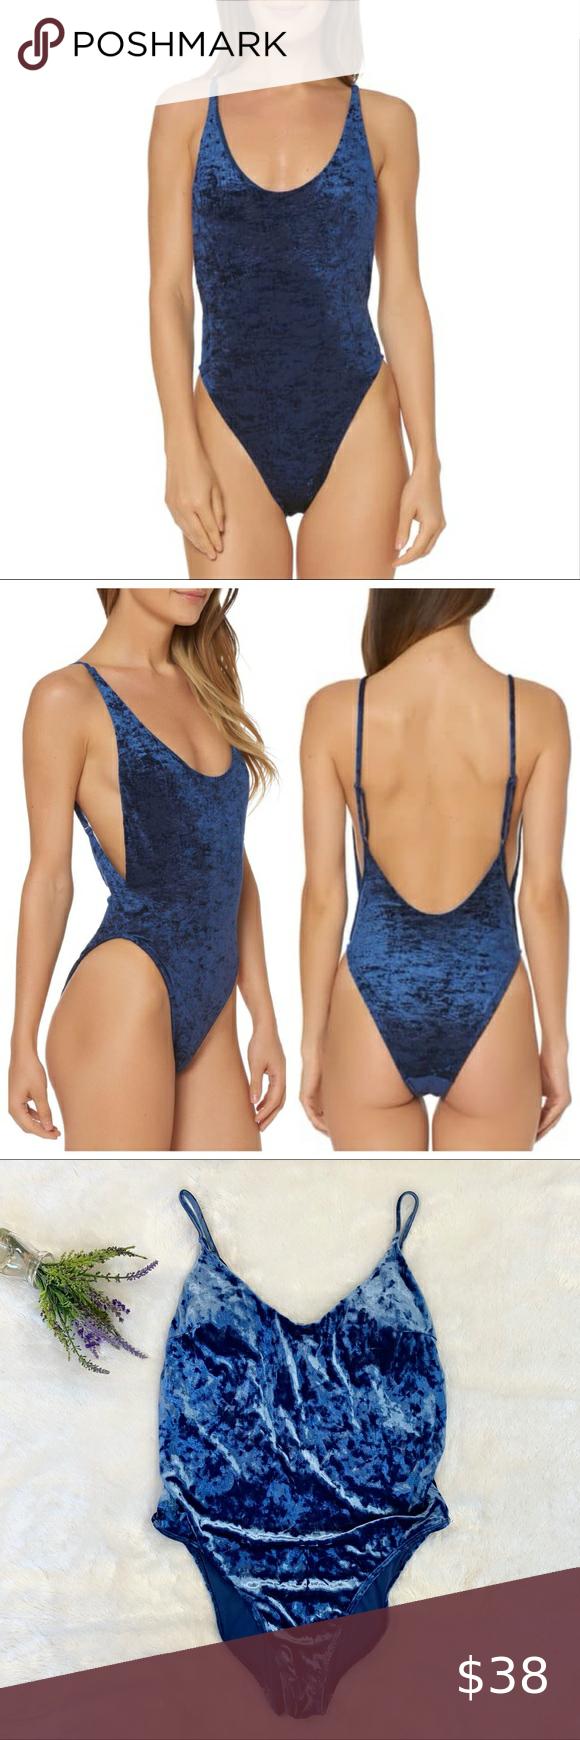 Dolce Vita Blue Velvet One Piece Swimsuit Velvet Swimsuit Fashion One Piece Swimsuit